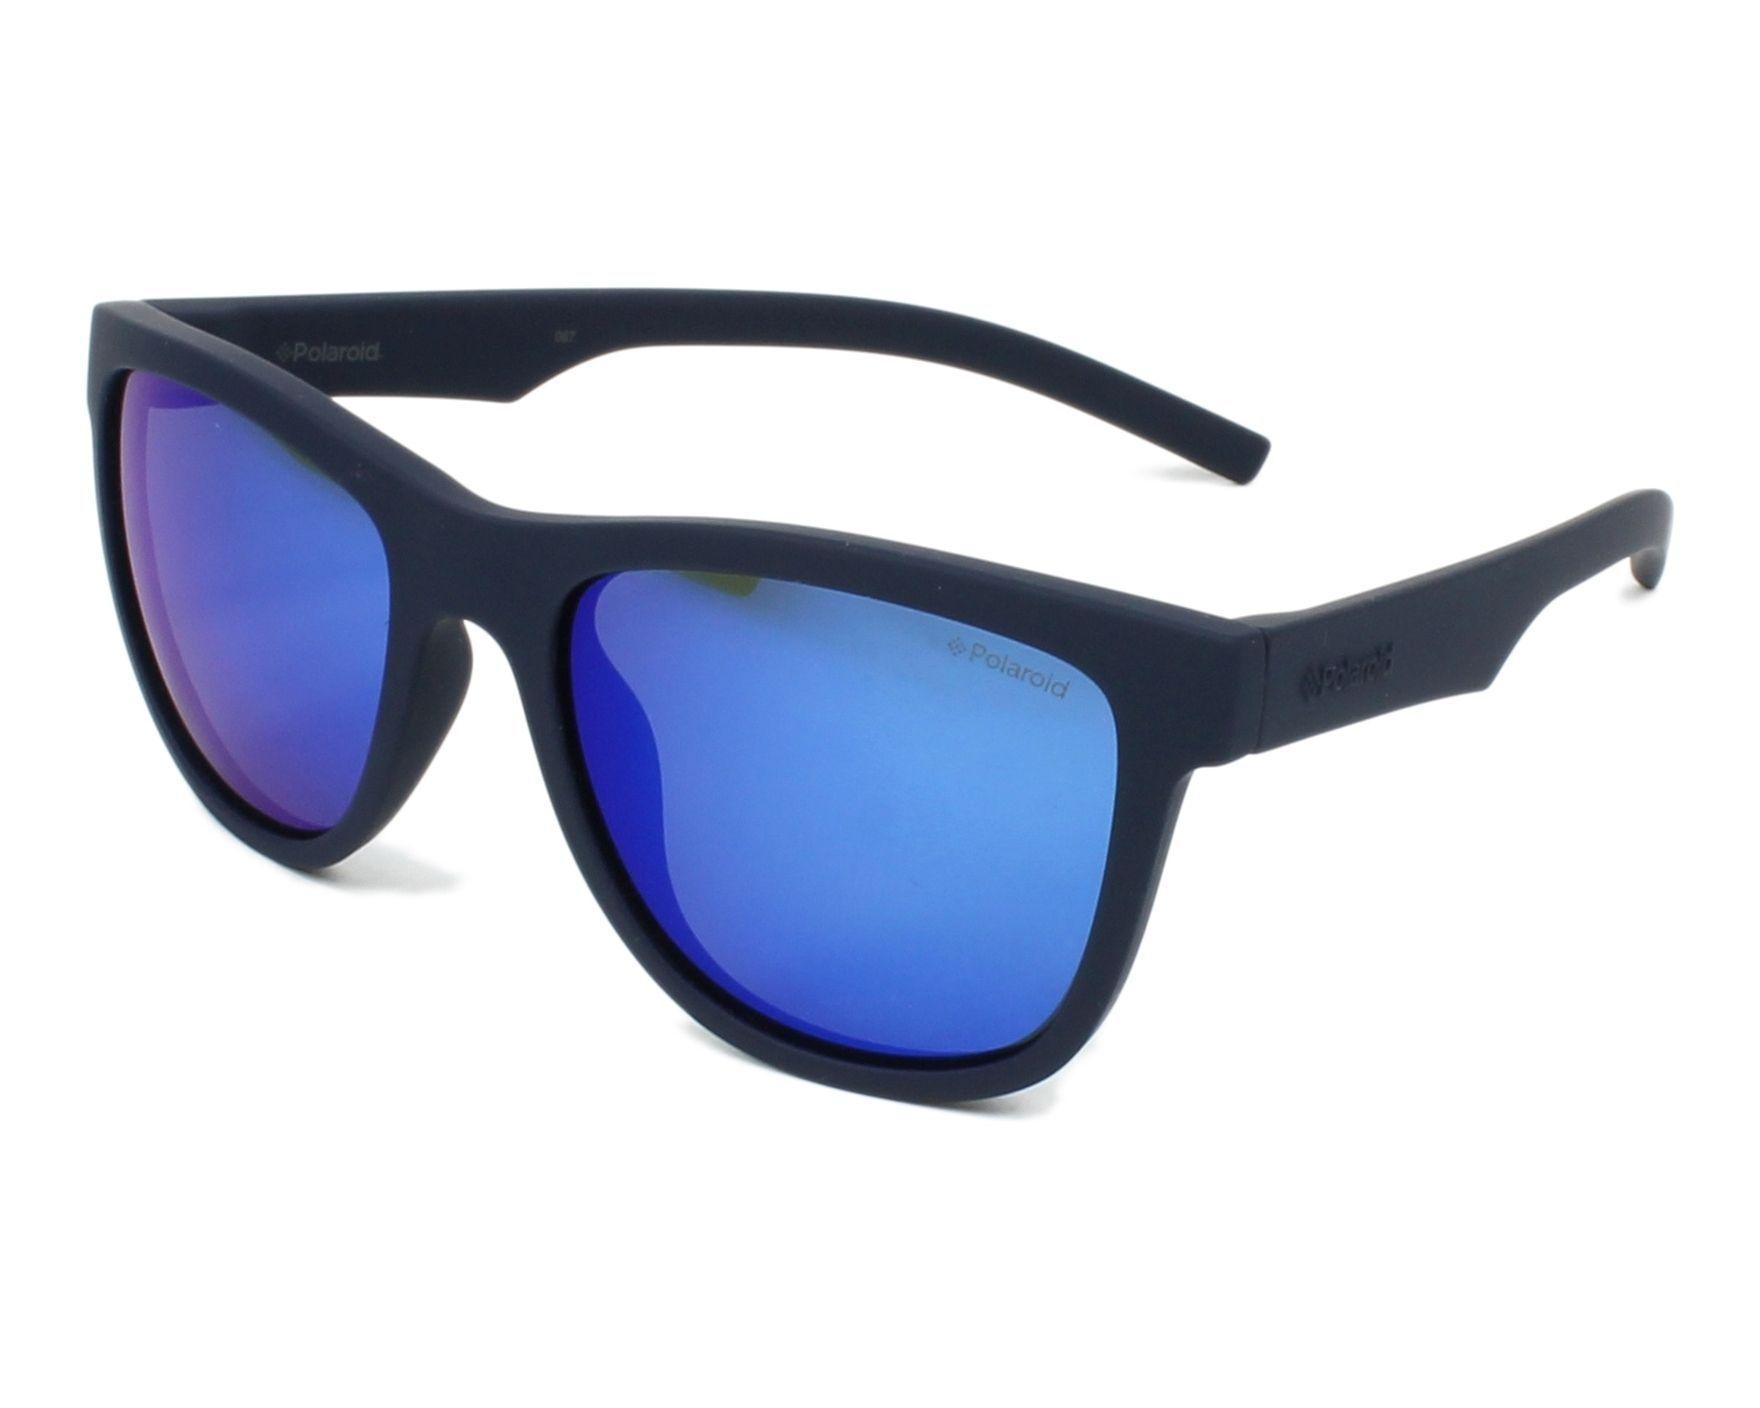 Óculos de Sol Infantil Polaroid Pld8018 S CIWJY - Omega Ótica e ... be1ff1b307